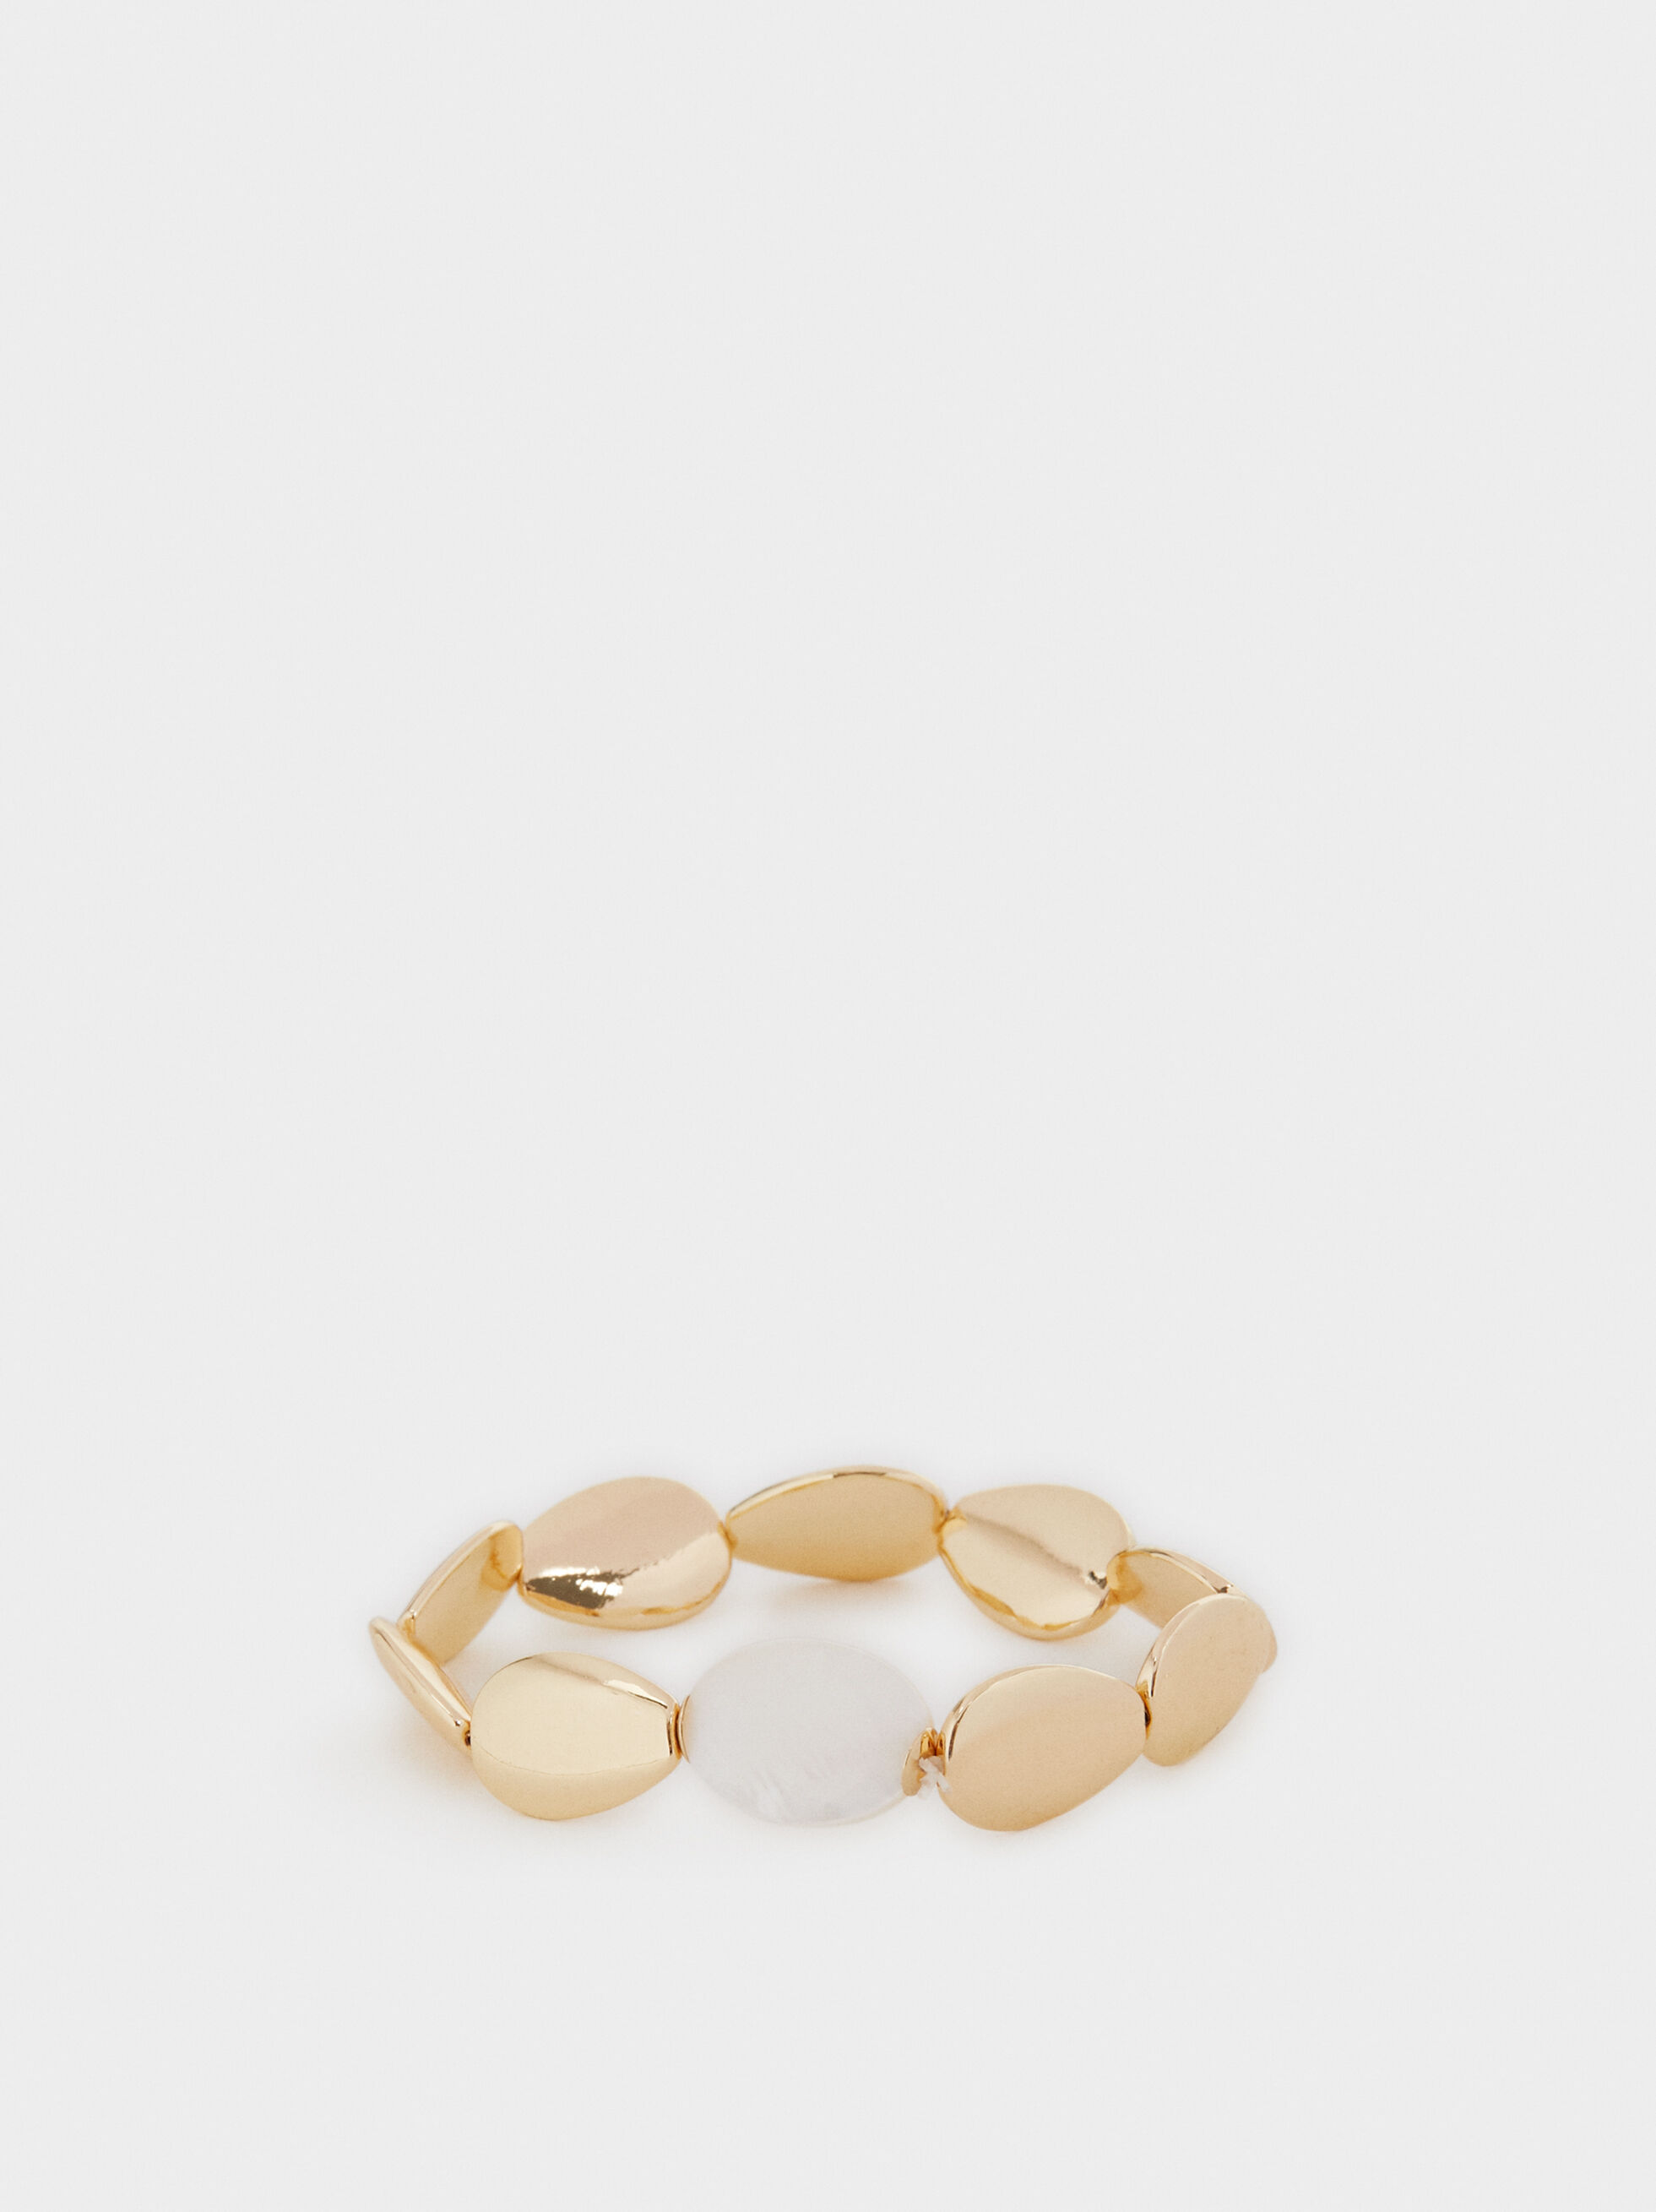 Gold Elastic Bracelet With Shells, , hi-res